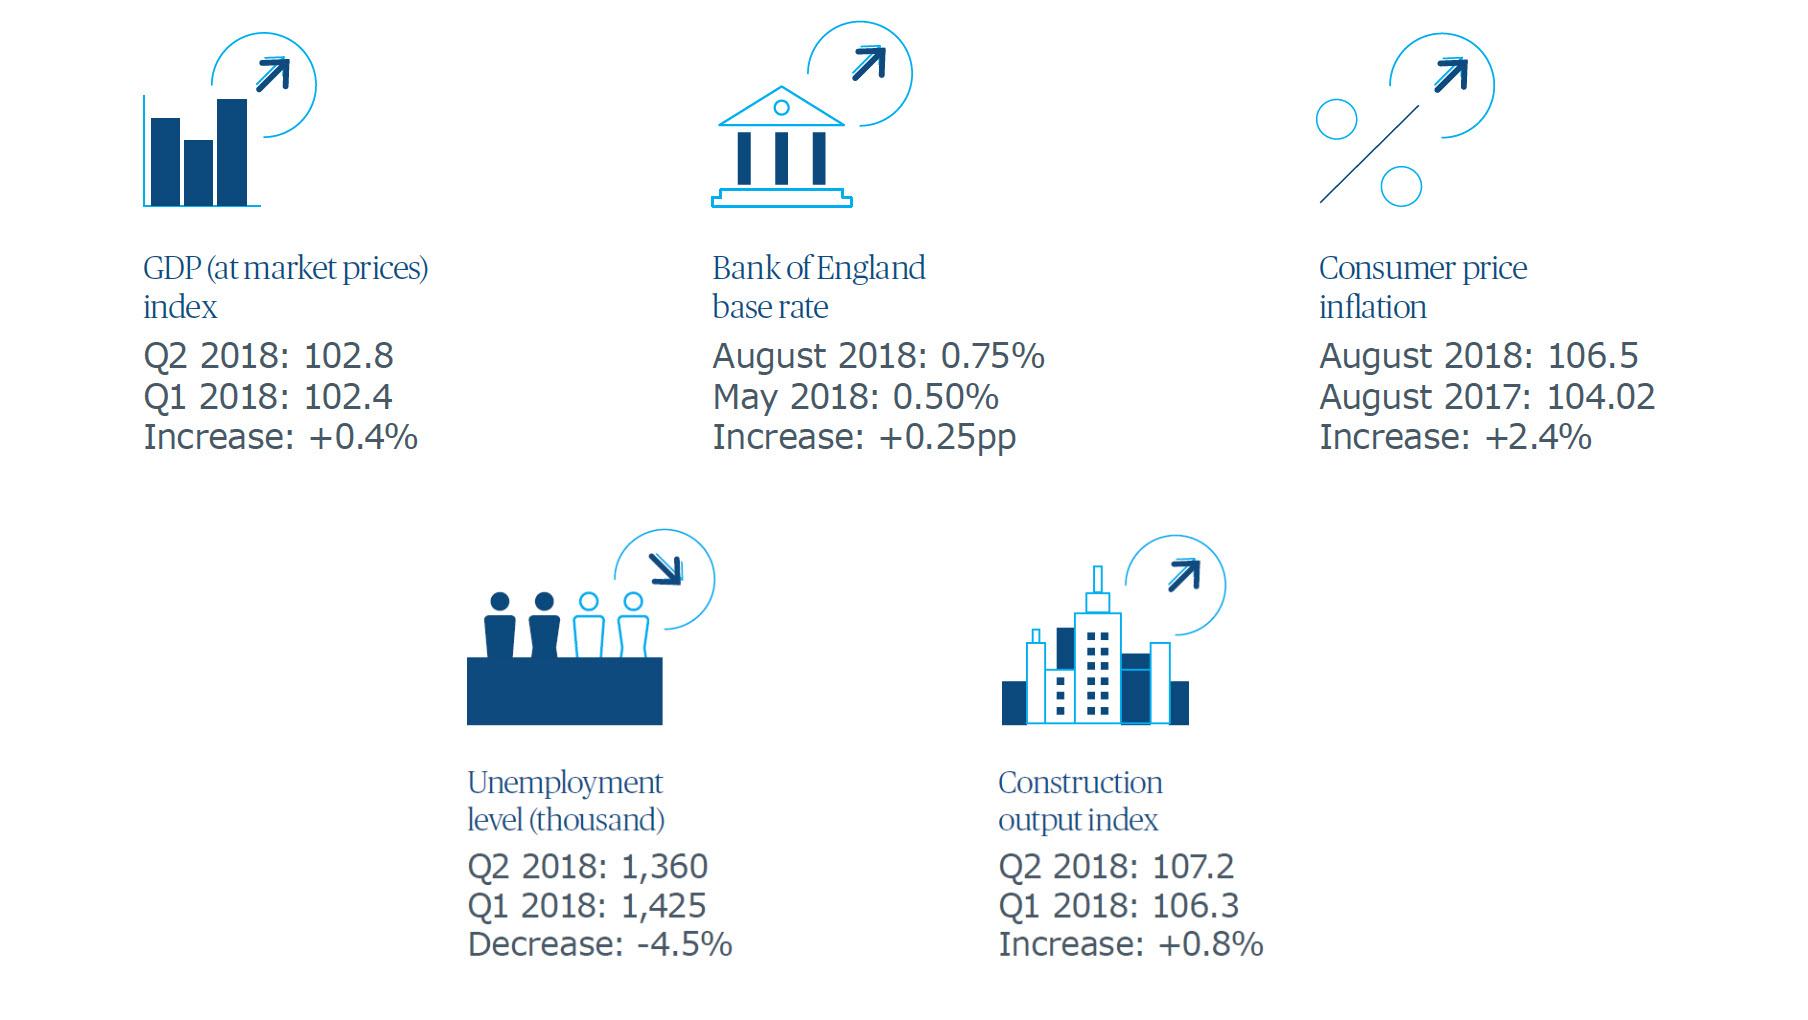 UK Market Intelligence Q3 2018: Contractors report order